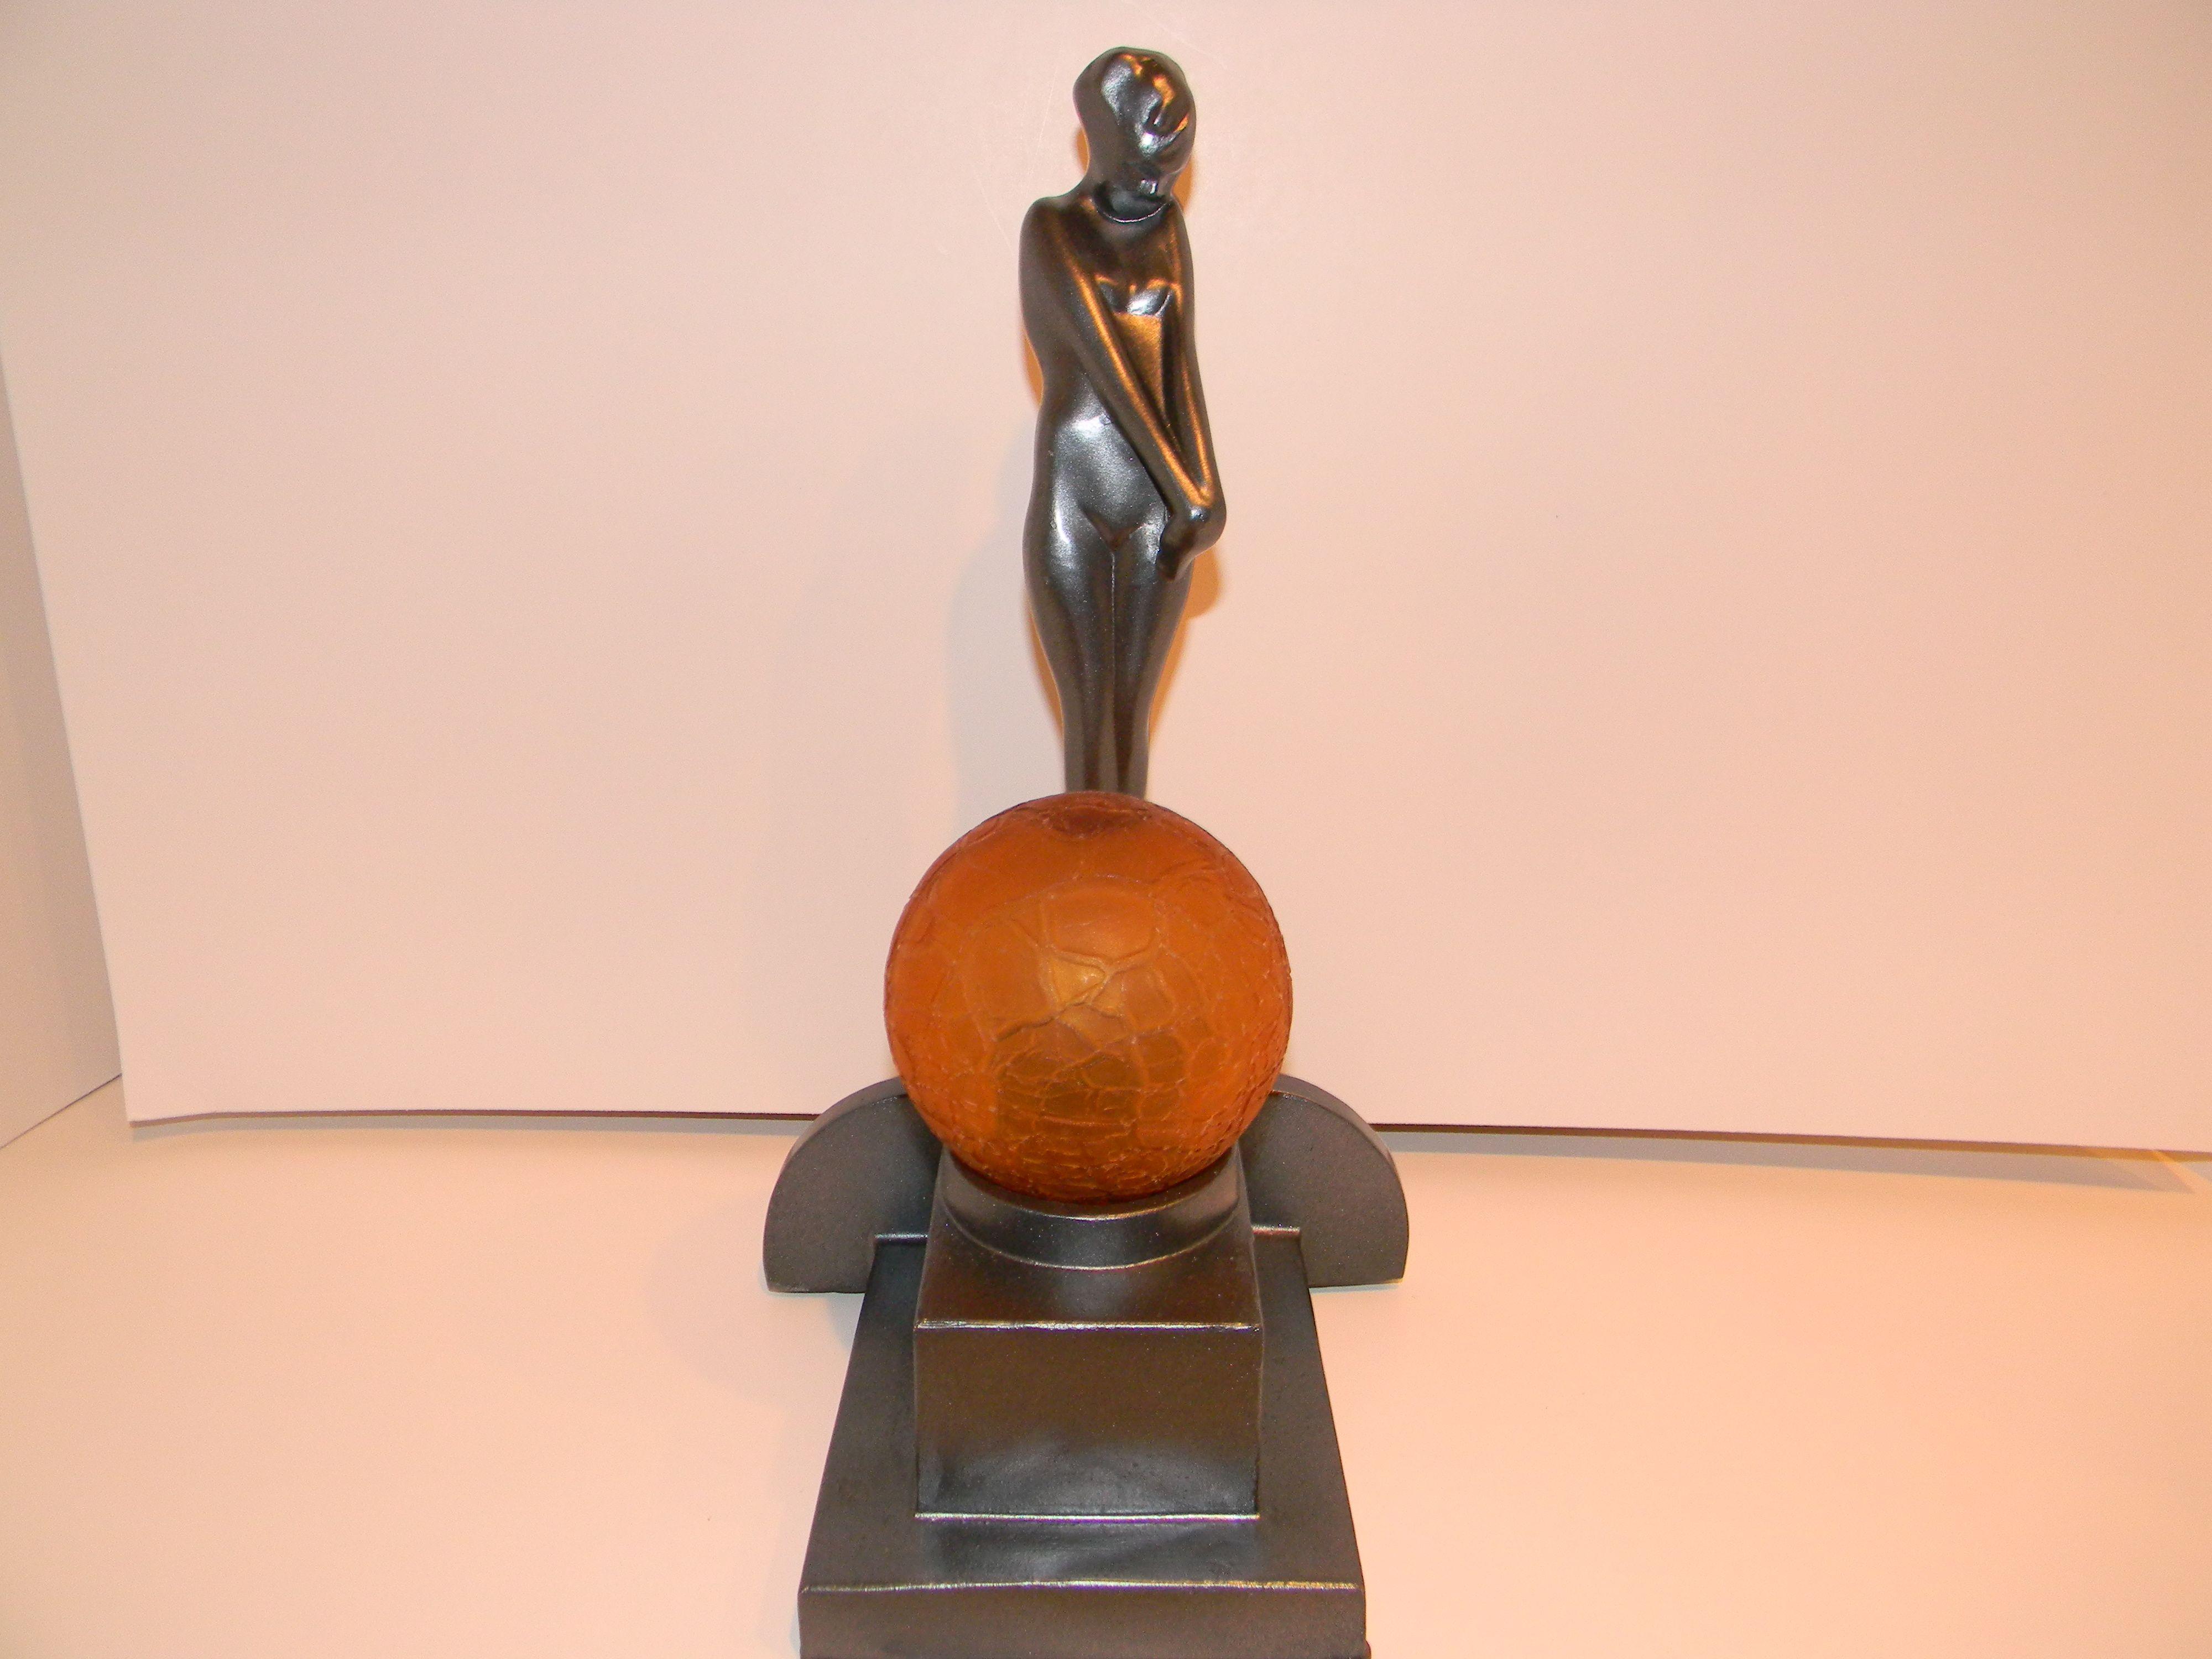 in antiqued republic statue stock bronze home lighting floor oly coco lights lamp homewares klemm